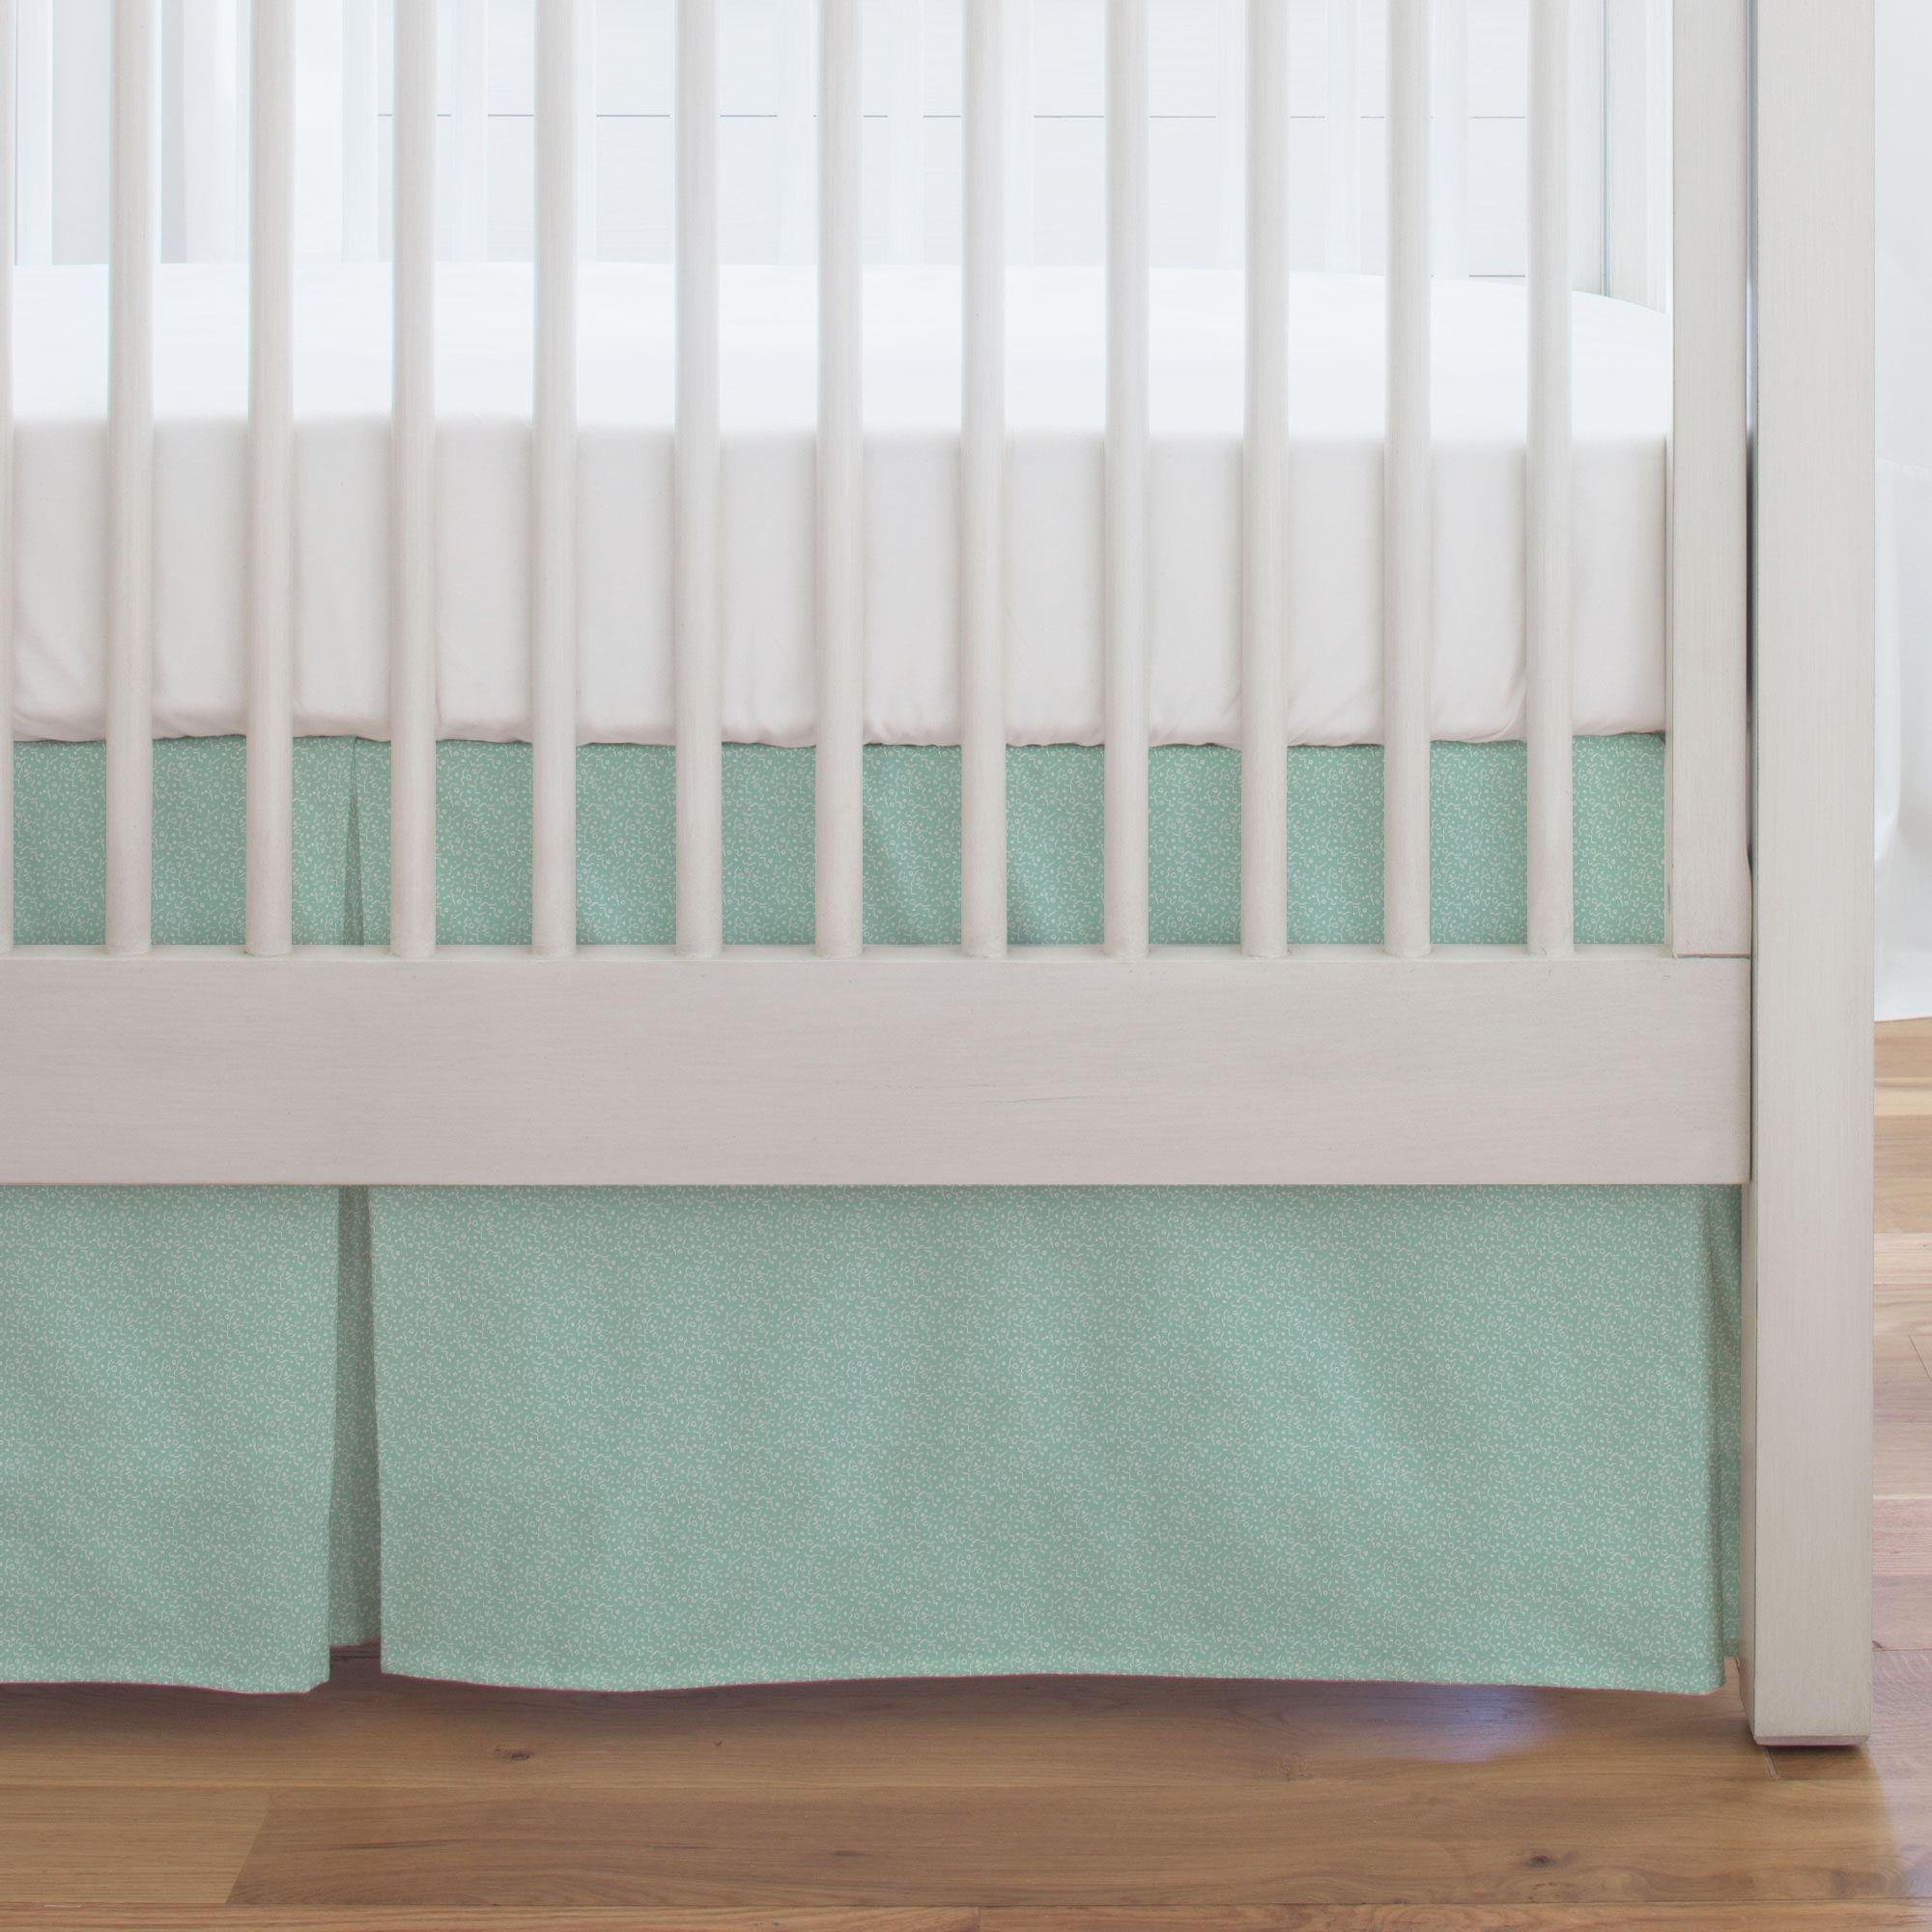 Carousel Designs Mint Confetti Crib Skirt Single-Pleat 17-Inch Length - Organic 100% Cotton Crib Skirt - Made in The USA by Carousel Designs